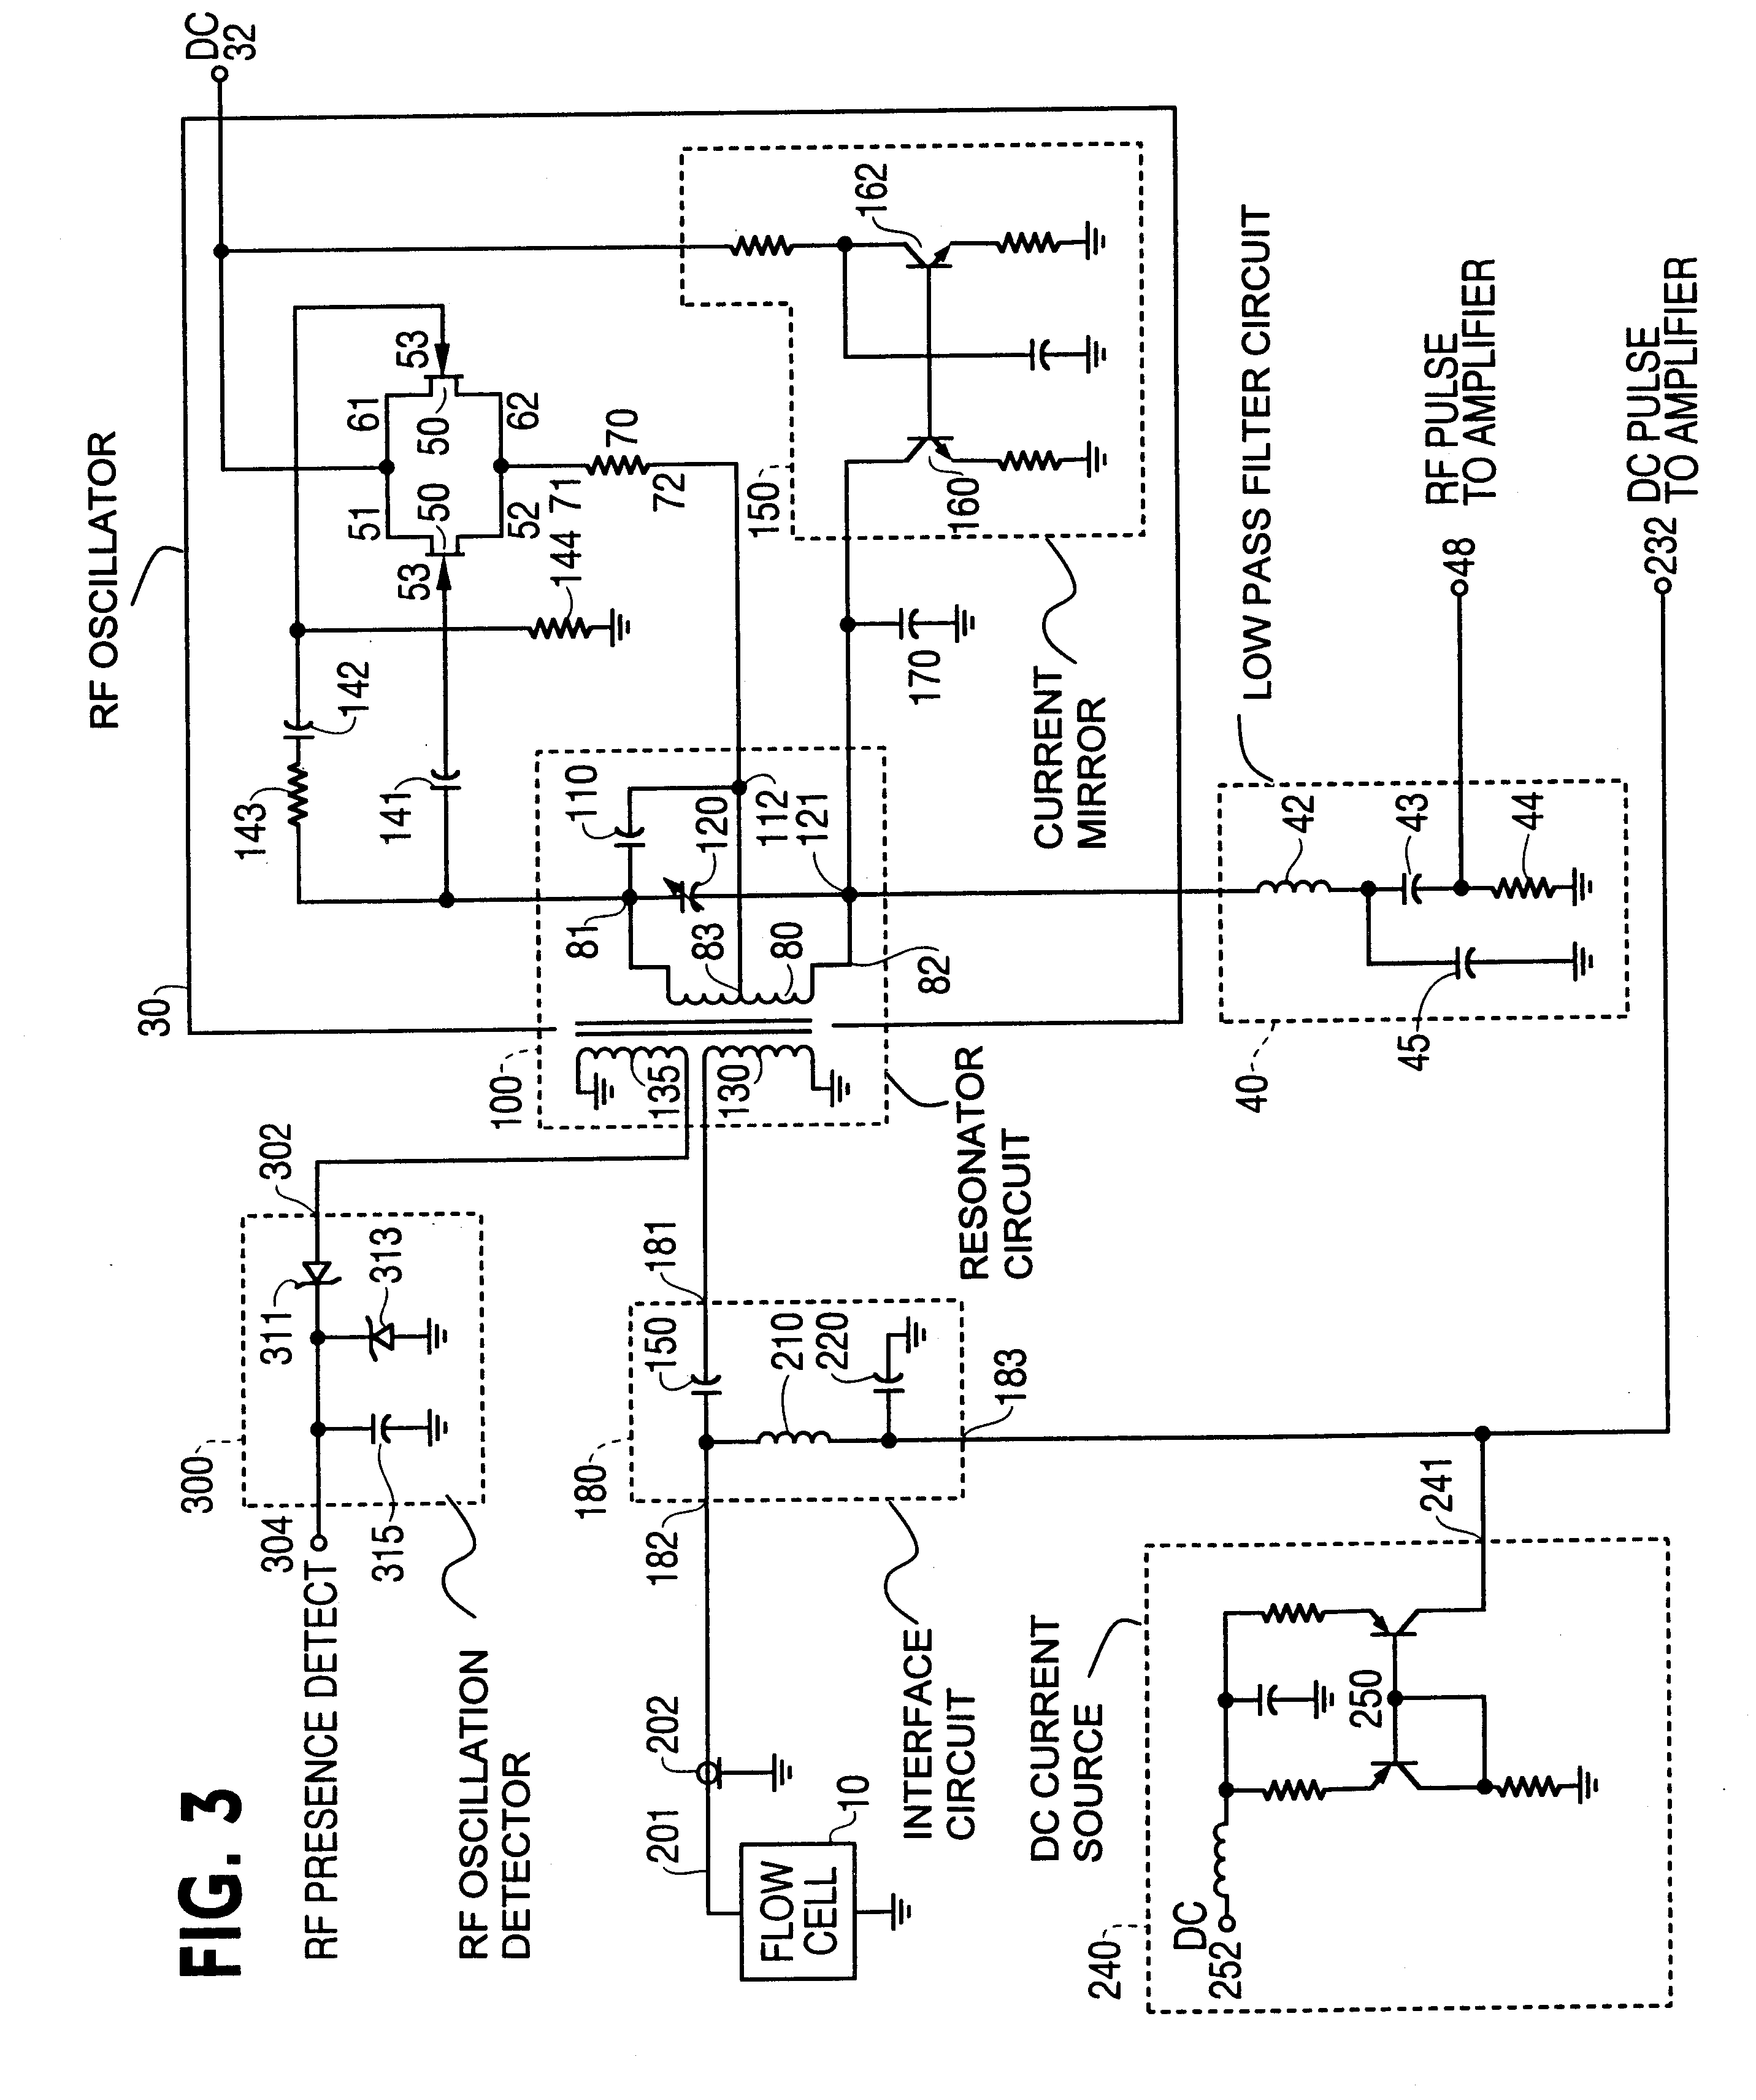 patent us6452372 - duet jfet rf oscillator-detector for flow cytometer